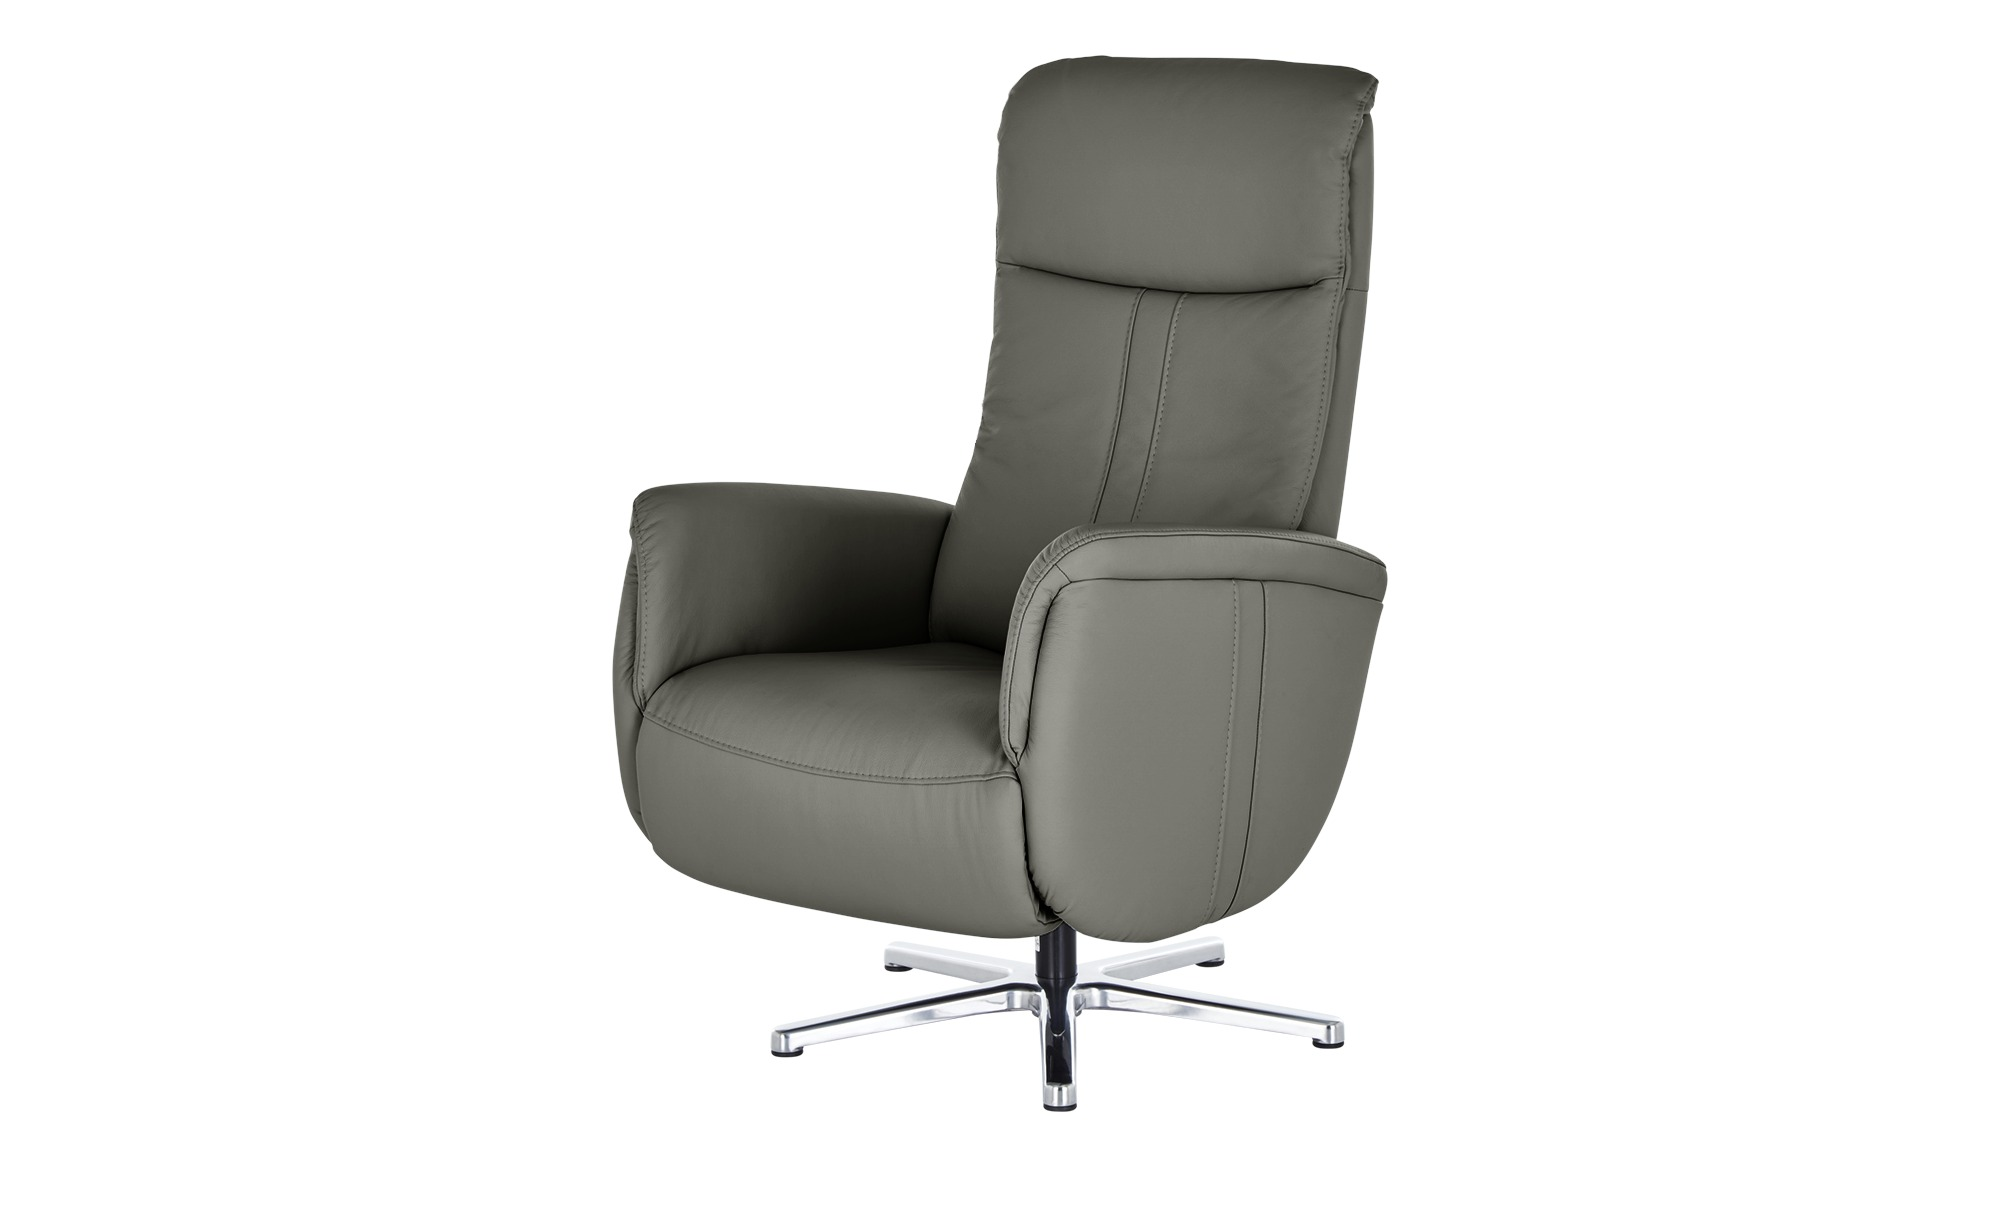 Relaxsessel  Franzi-L ¦ grau ¦ Maße (cm): B: 71 H: 112 T: 83 Polstermöbel > Sessel > Fernsehsessel - Höffner